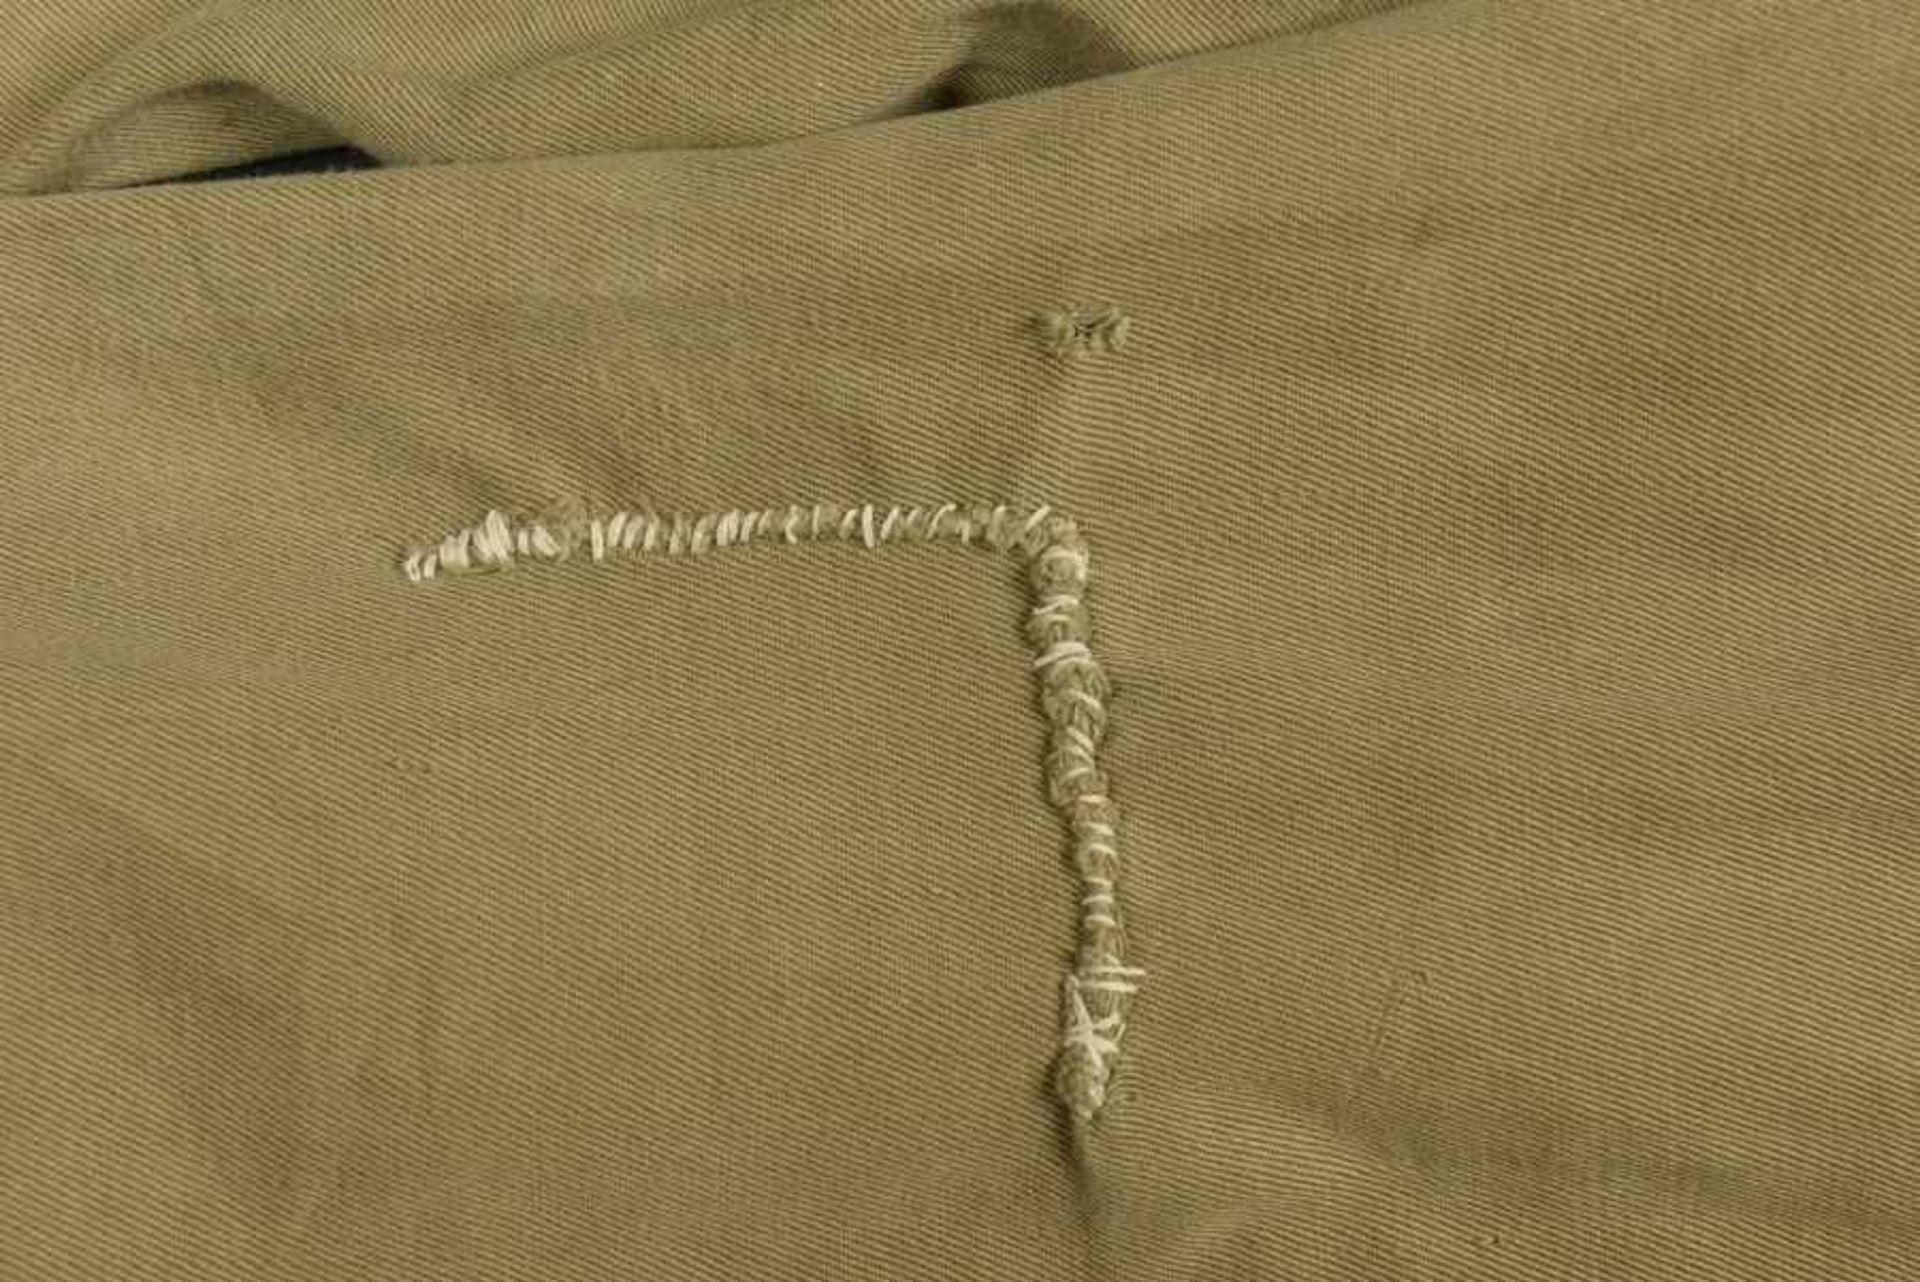 Pantalon du parachutiste américain B Orsborn. Pants of American paratrooper B OrsbornEn popeline, - Bild 2 aus 4